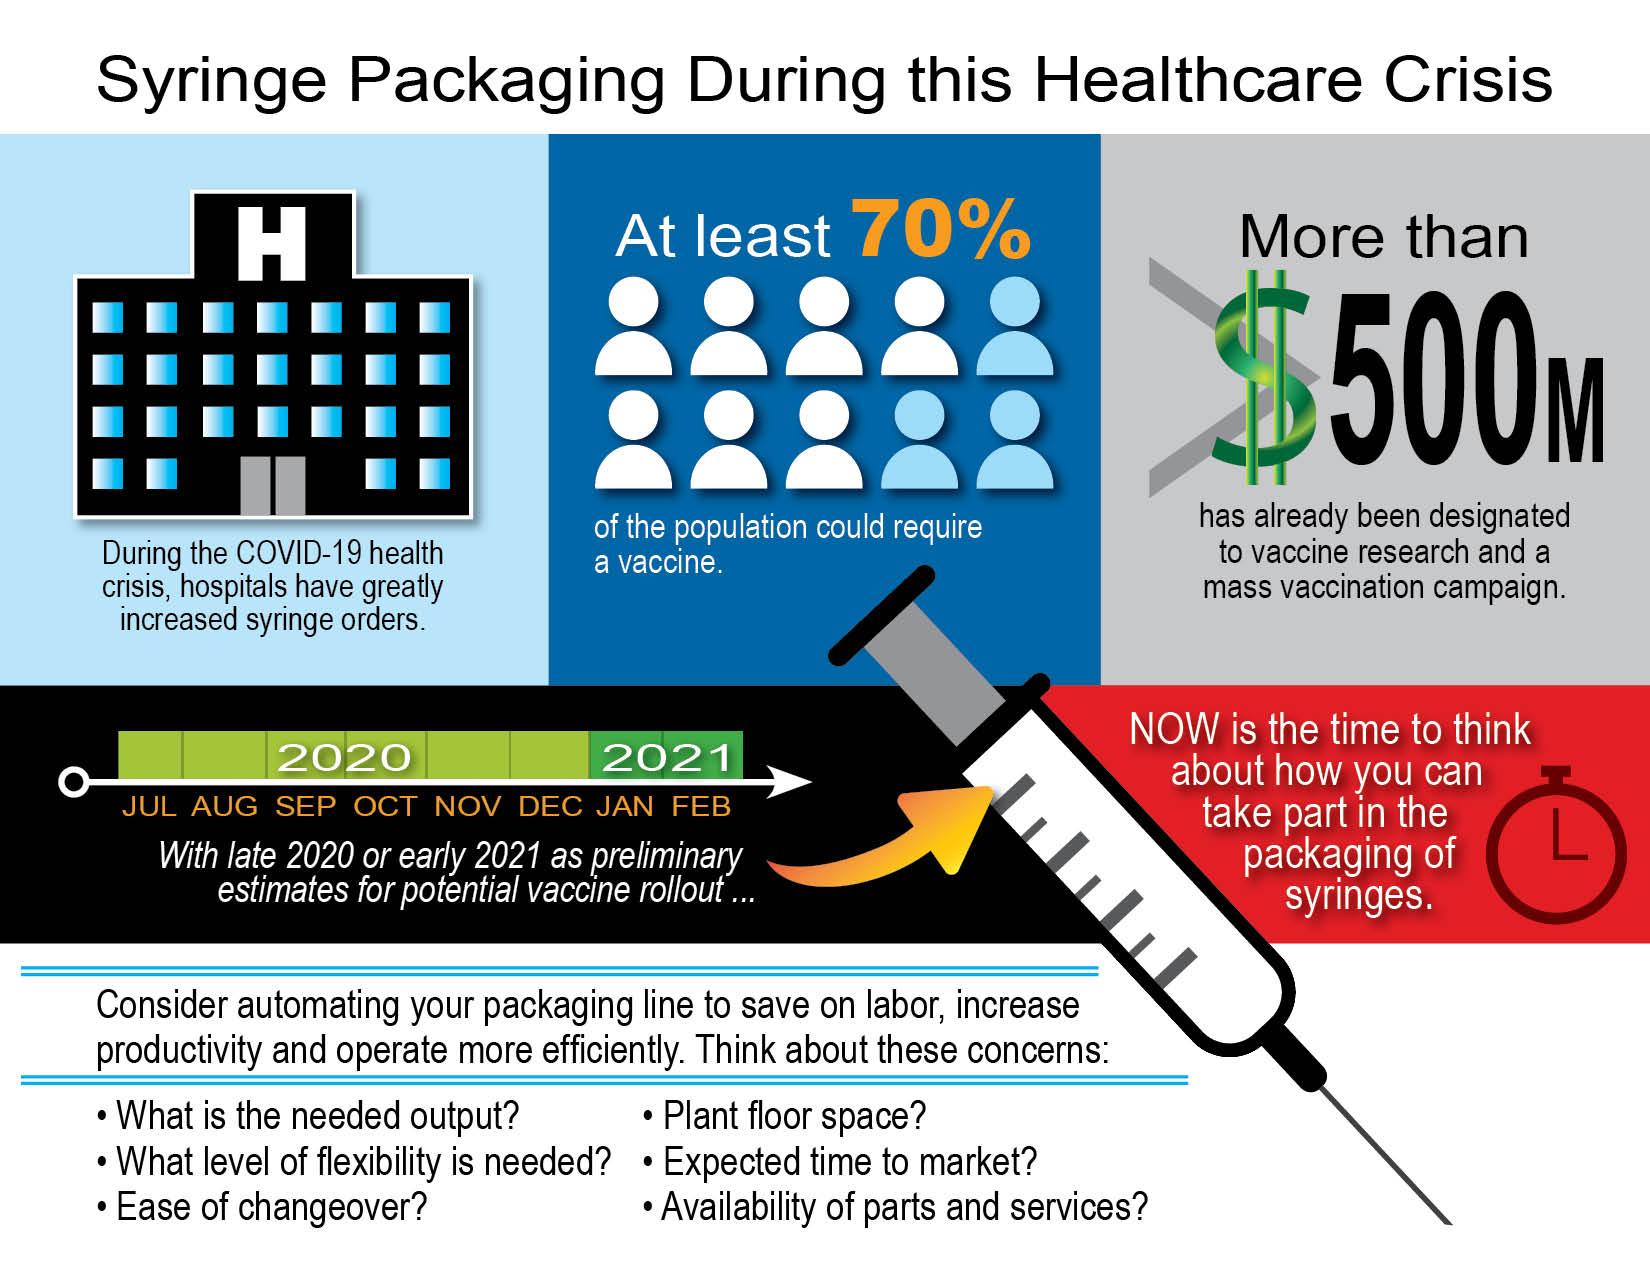 IG_PackagingSyringes_COVID-19